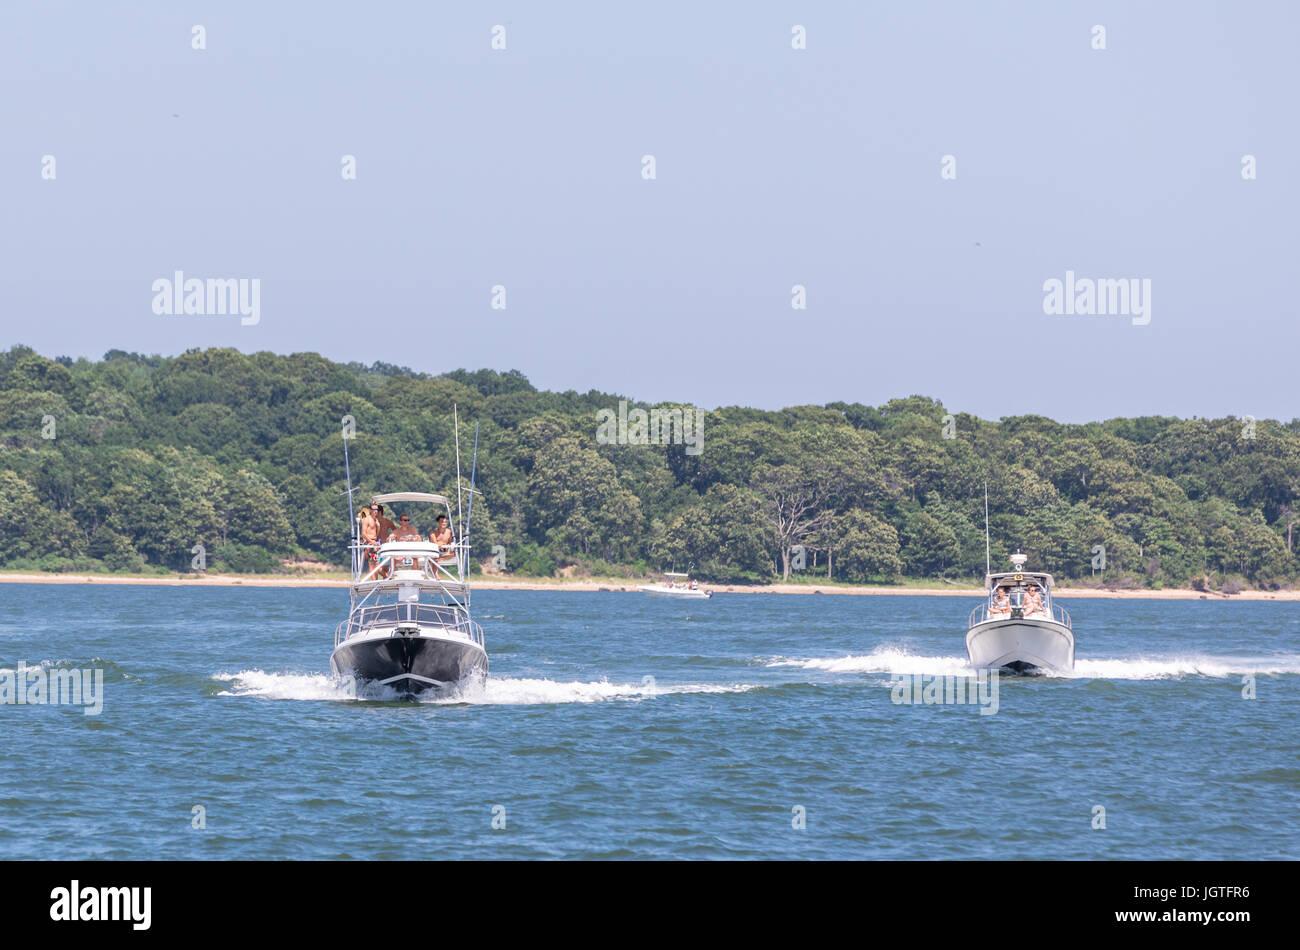 two power boats underway of shelter island, ny - Stock Image